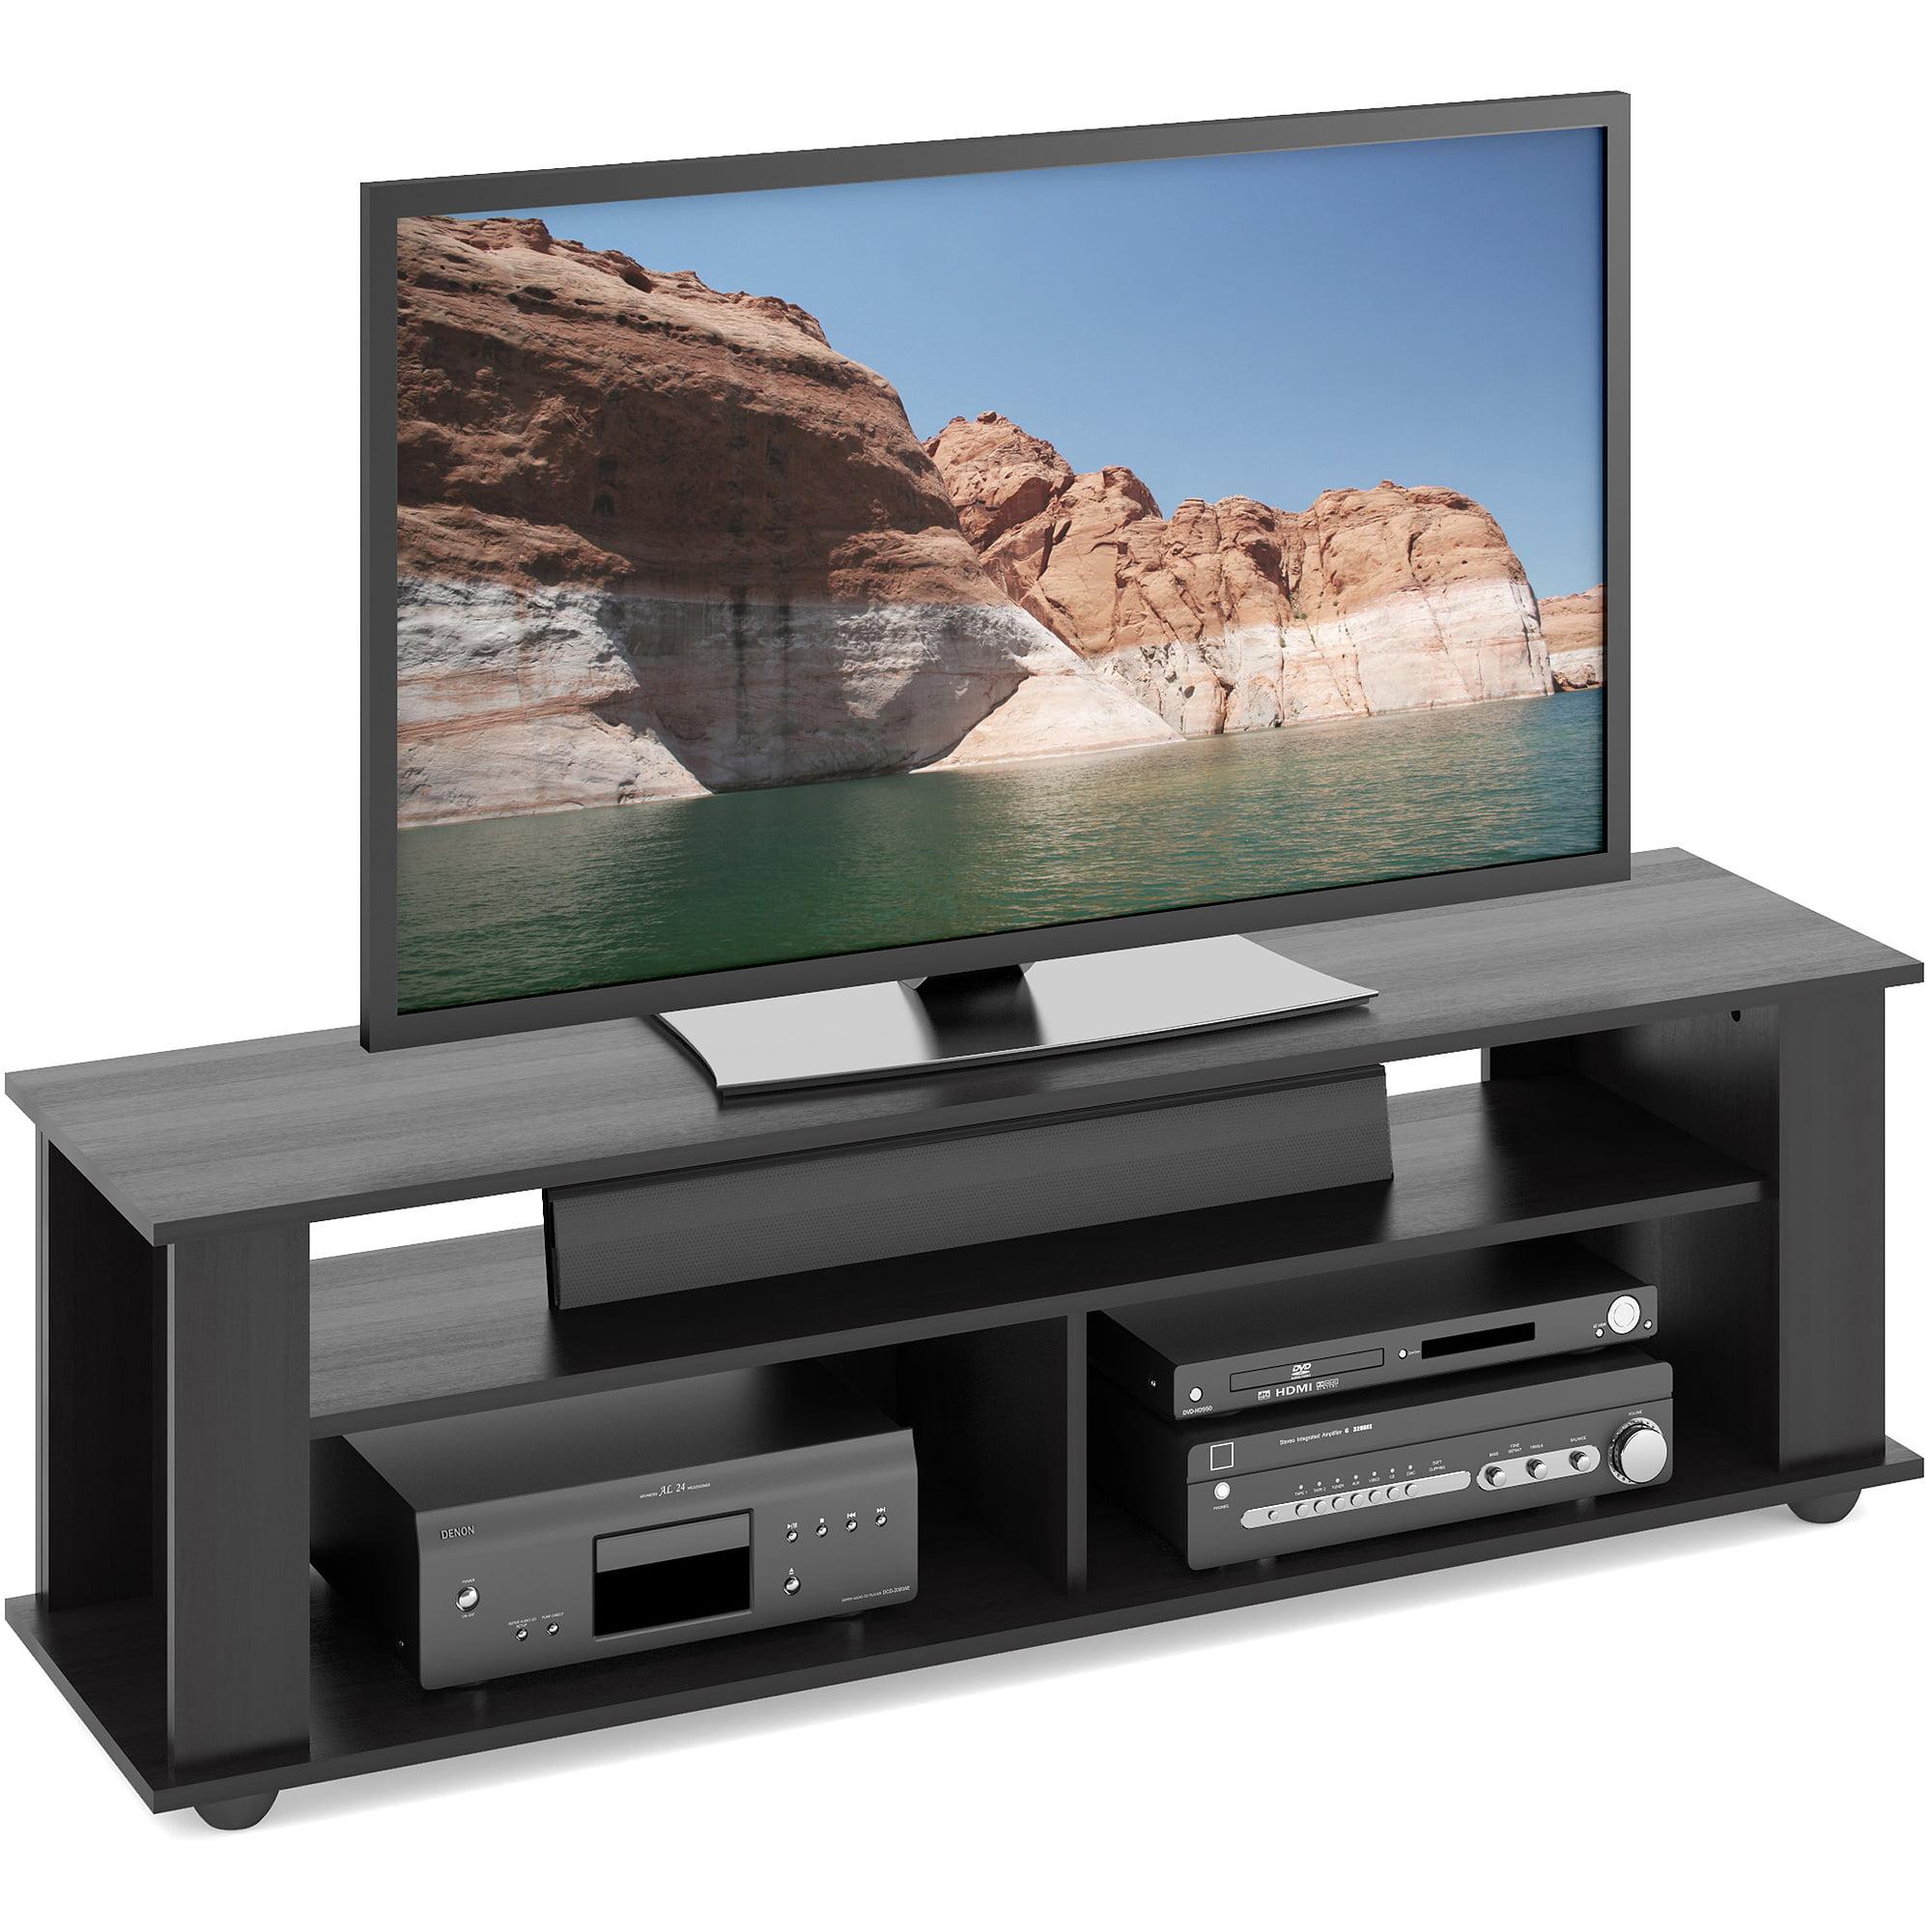 CorLiving Bakersfield Ravenwood Black TV Stand for TVs up to 65